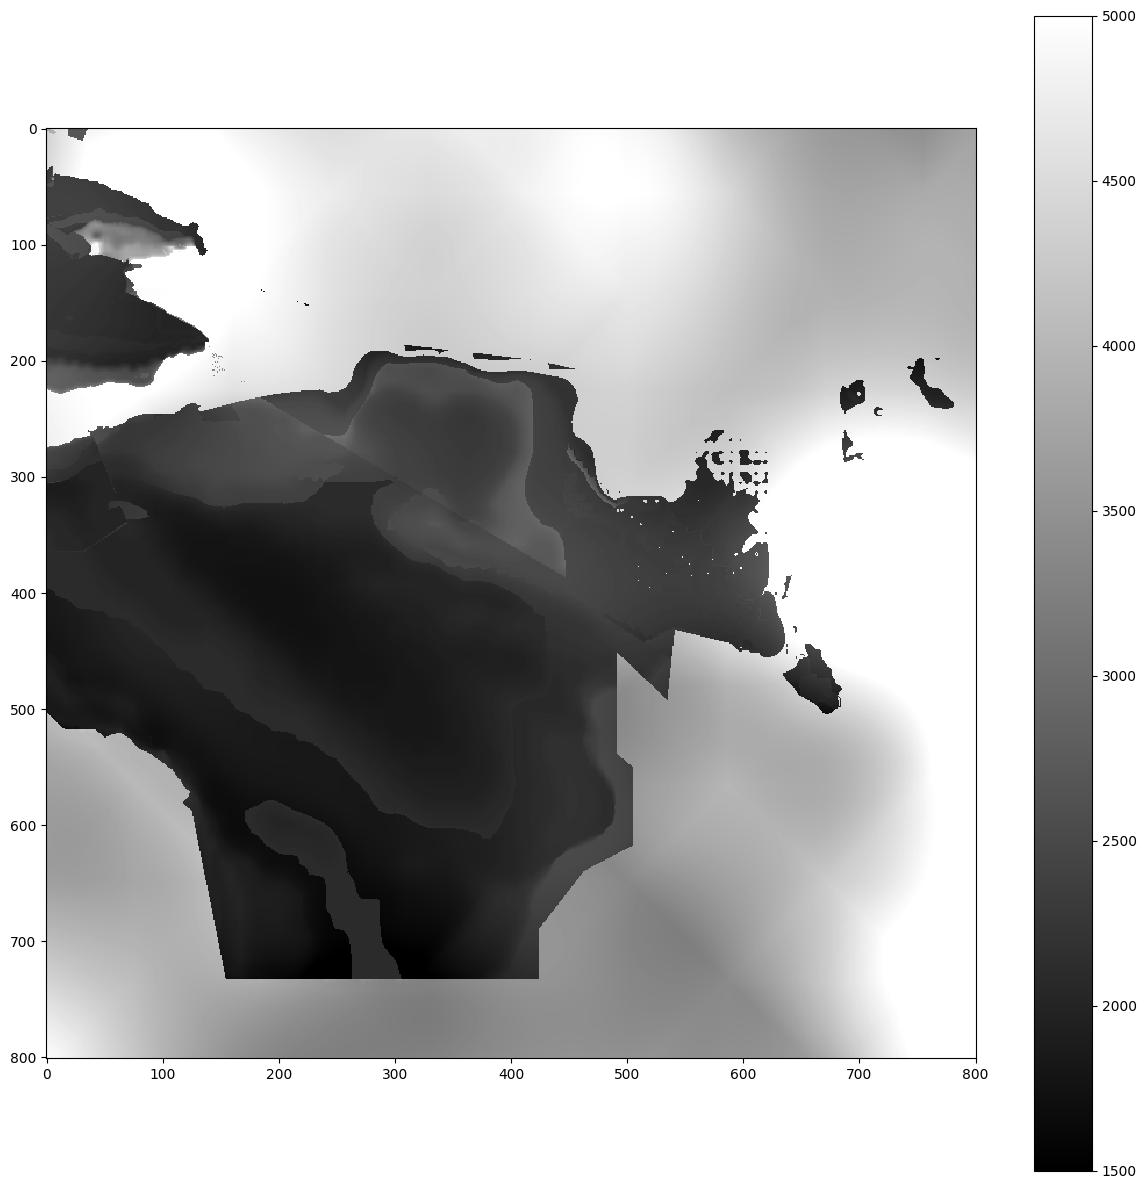 bench/seismic/wp/la_habra/meshes/velocity_model/plots/vp_500.png